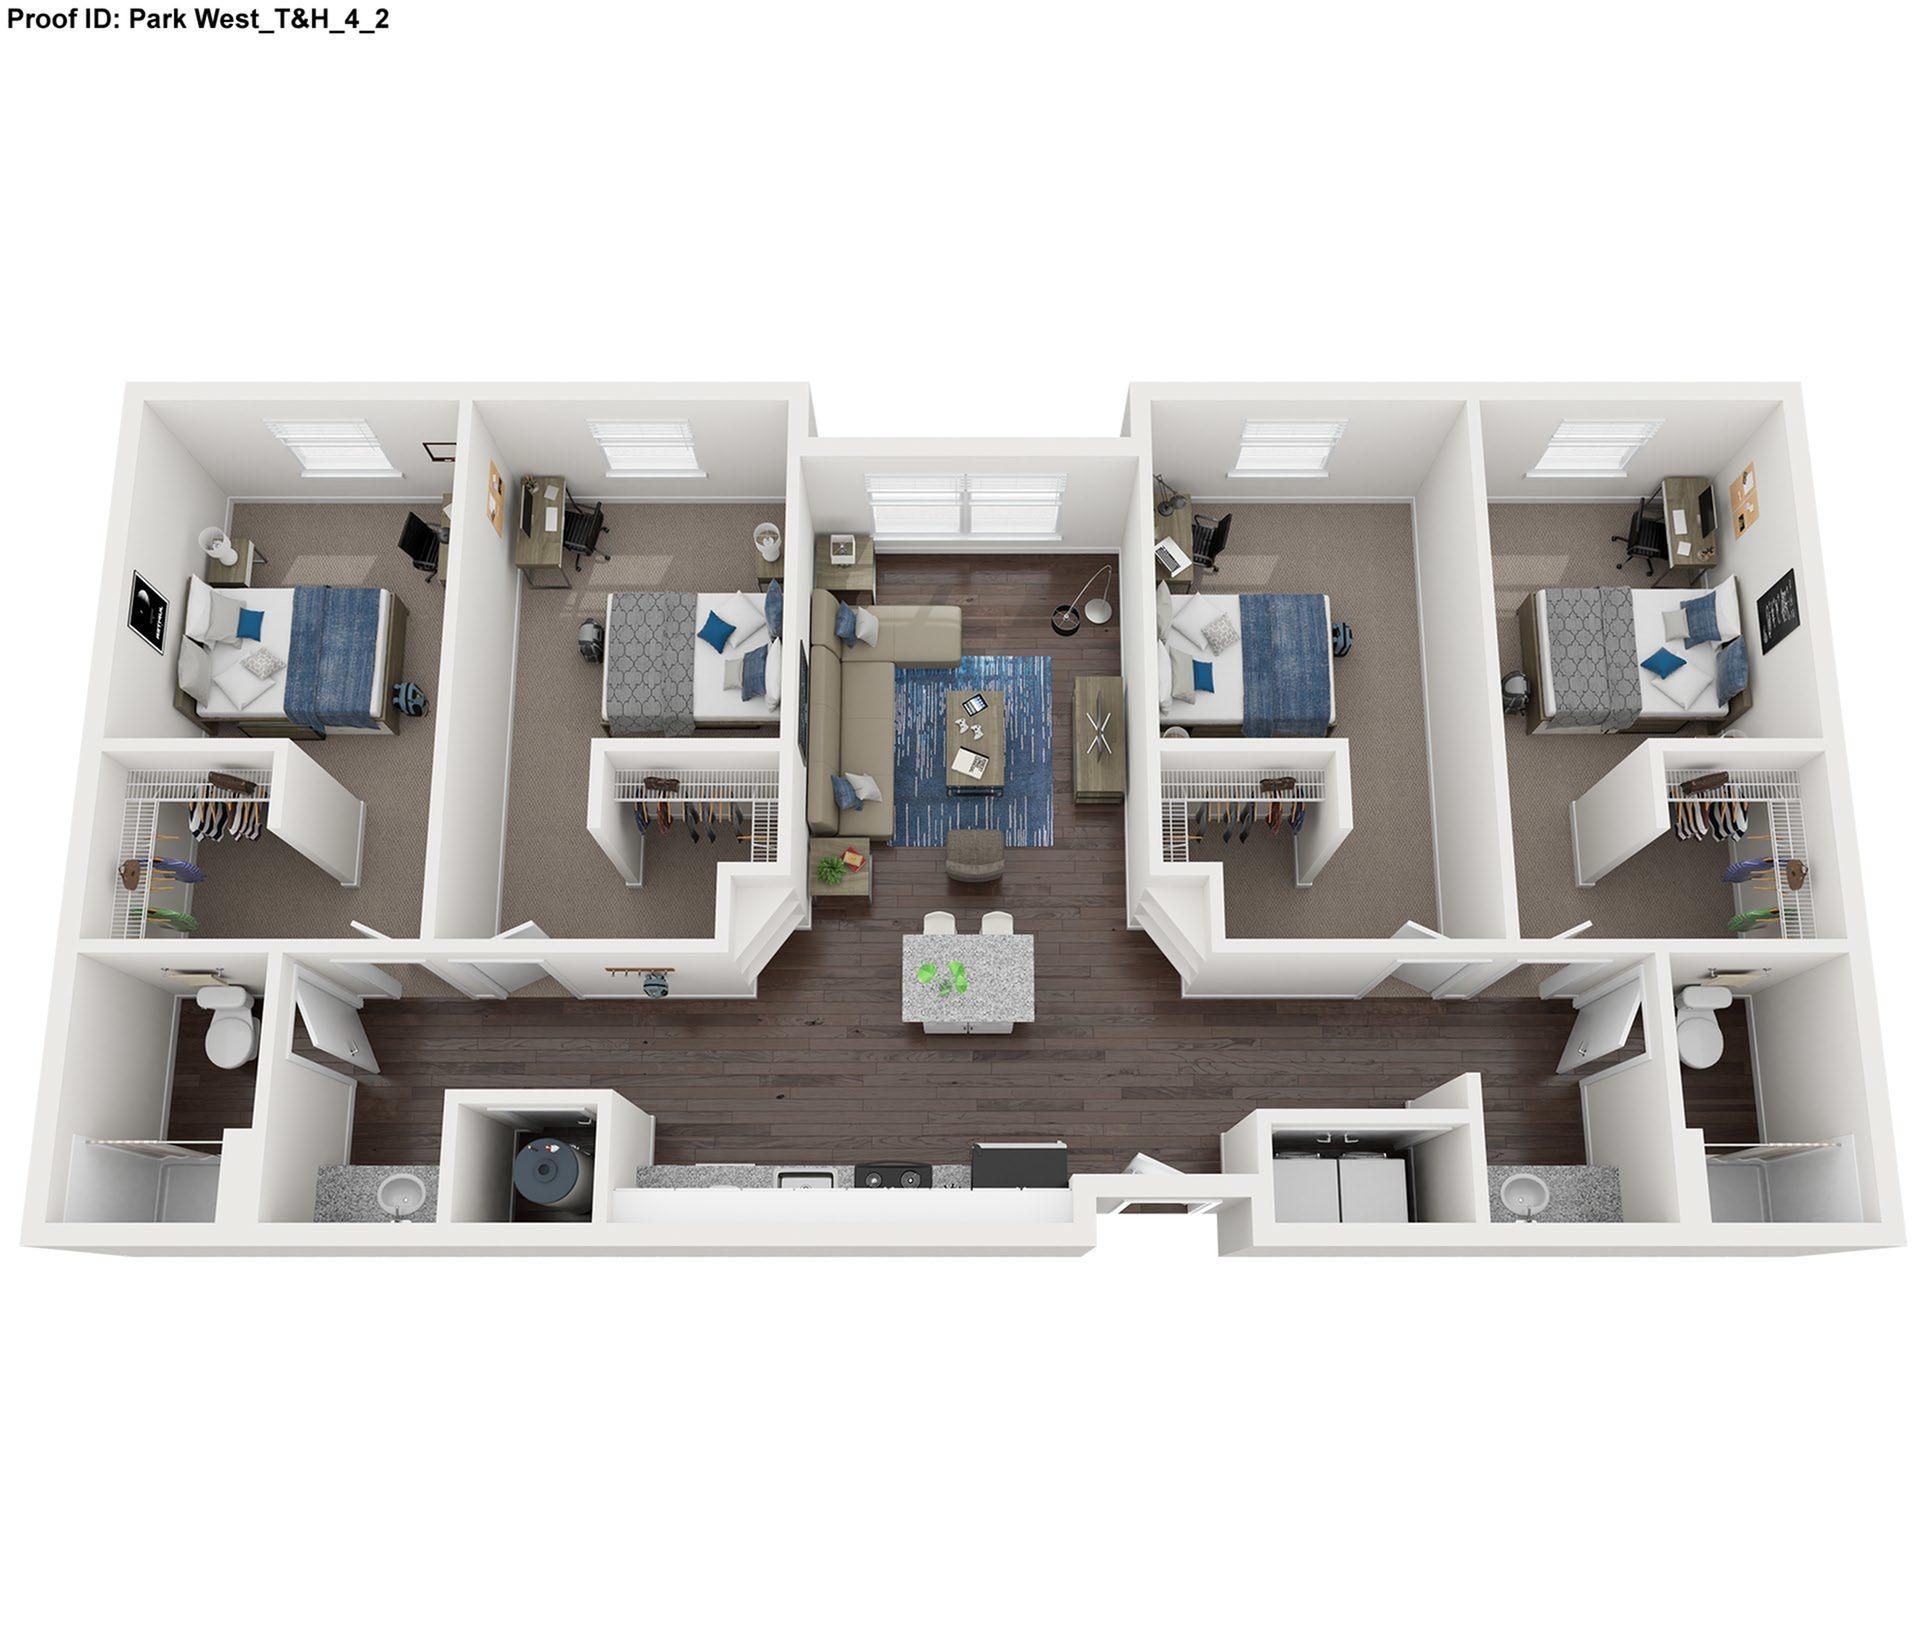 4 Bdrm 2 Bath Floor Plan